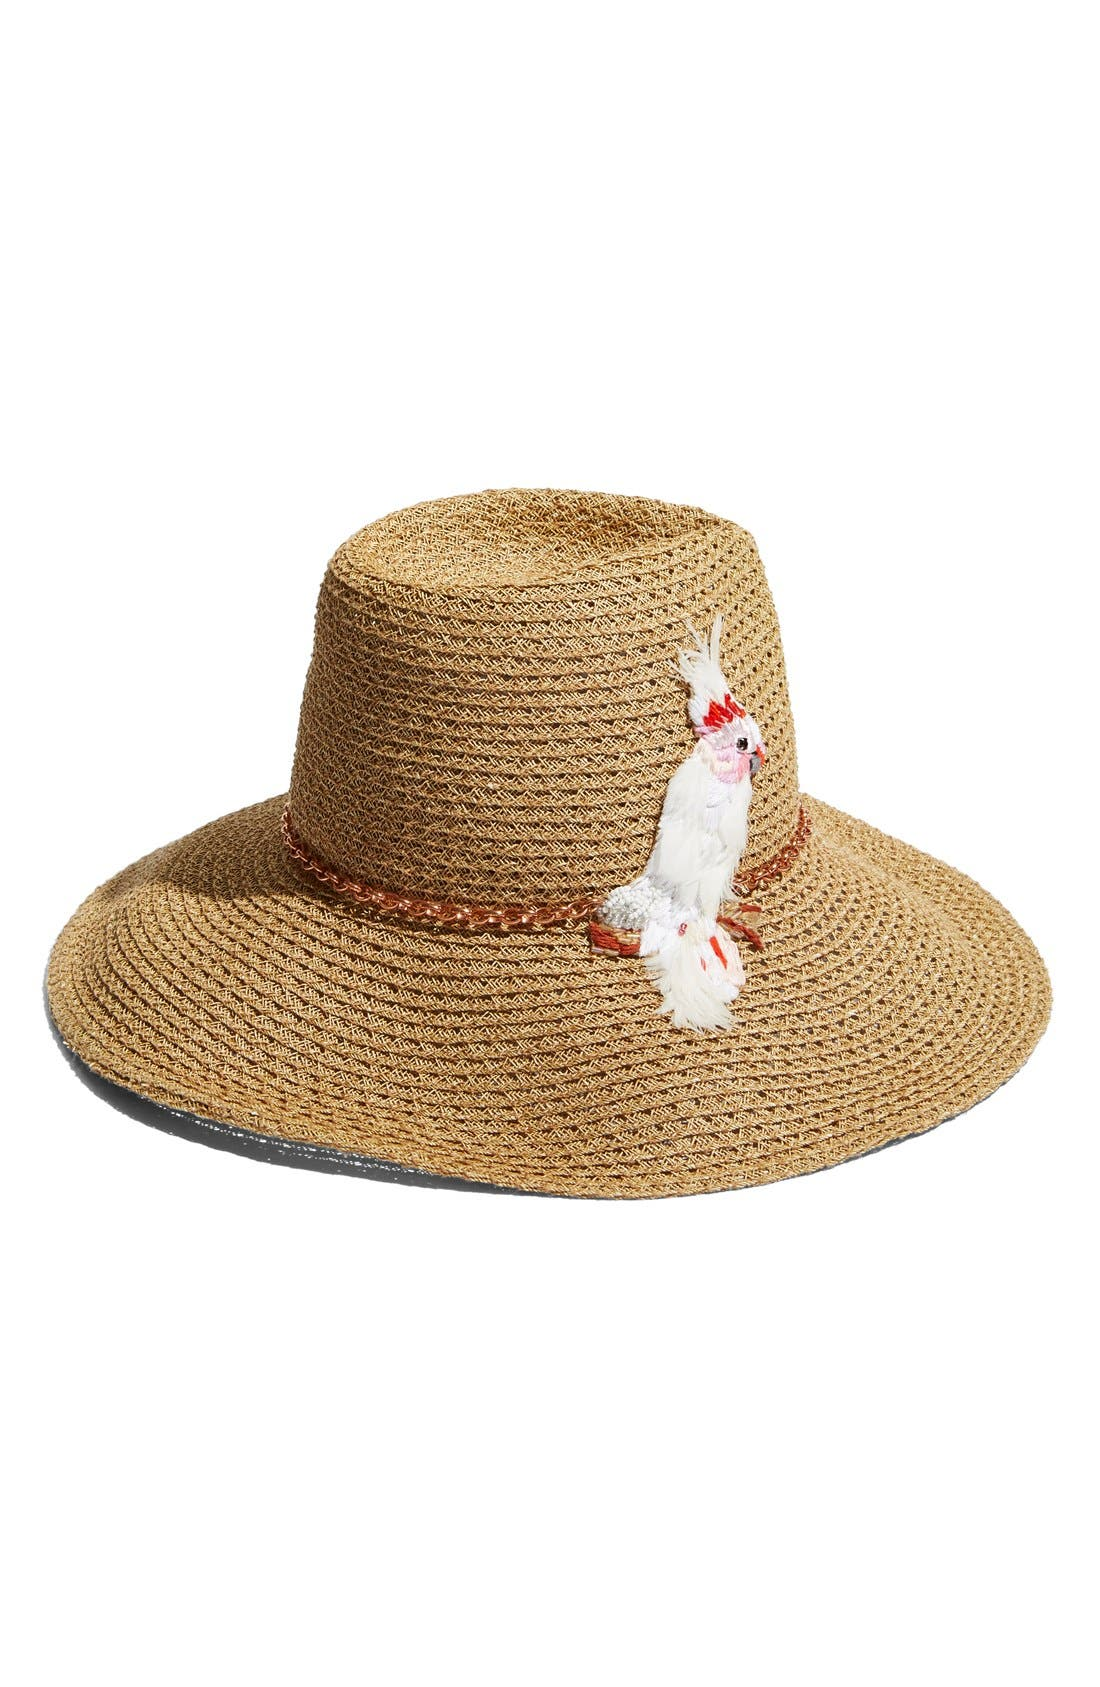 'Emmanuelle' Cockatoo Ornament Straw Hat,                             Alternate thumbnail 4, color,                             250